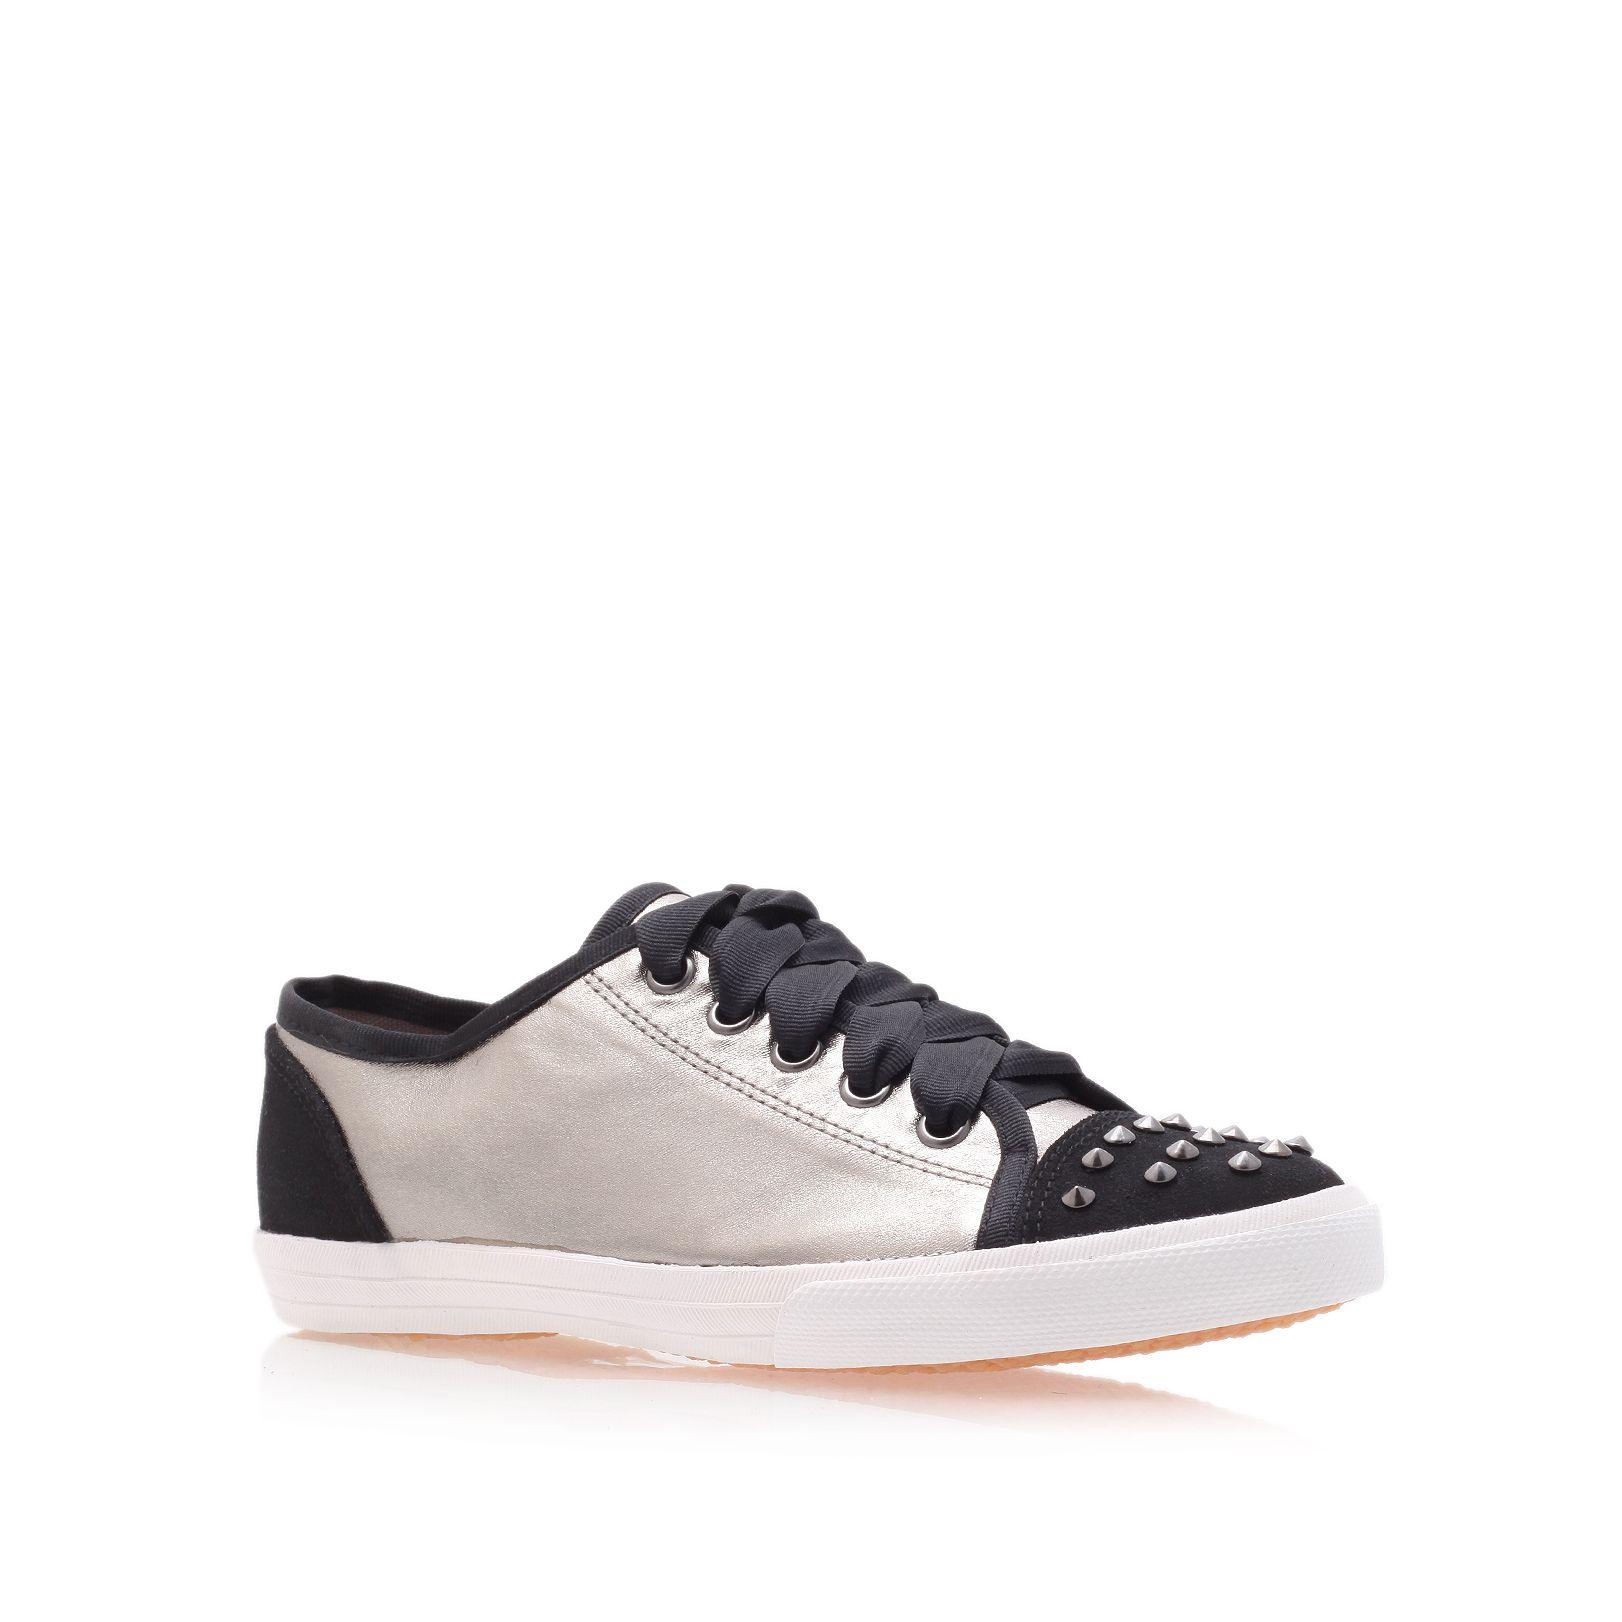 Carvela Kurt Geiger Jenson Trainer Shoes In Gray For Men | Lyst